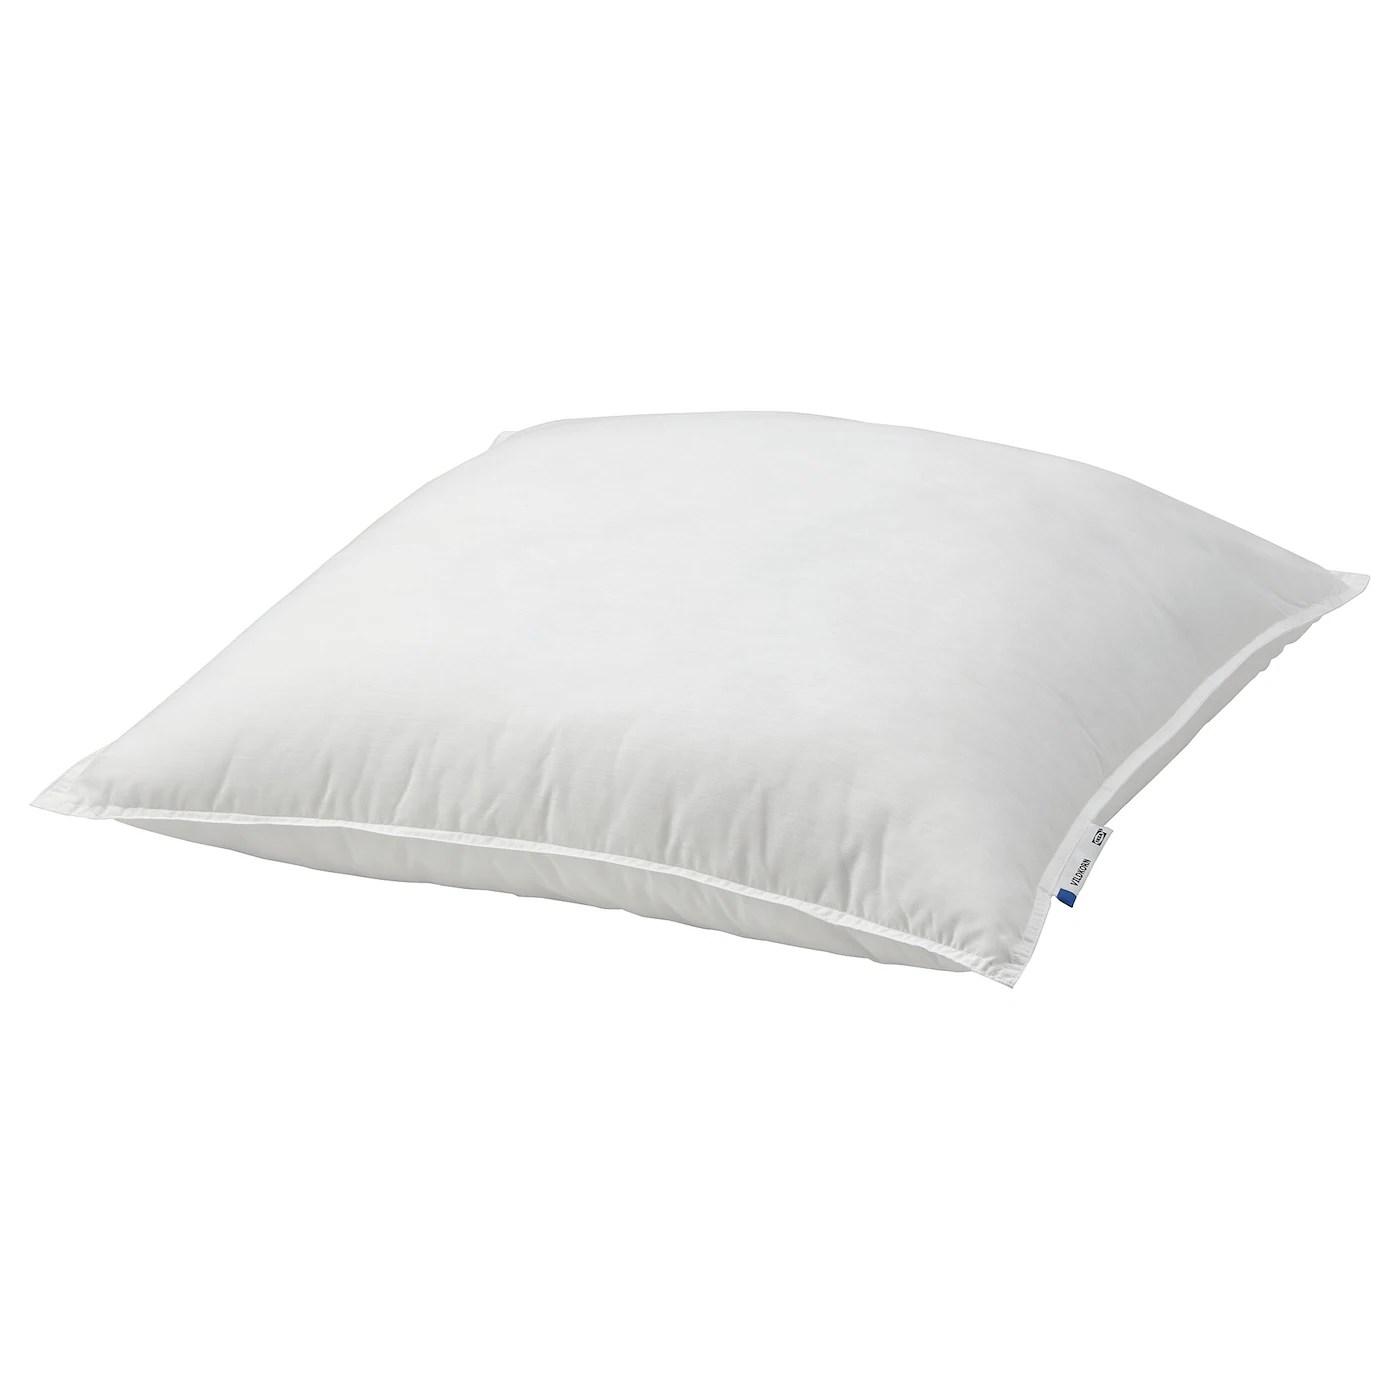 Vildkorn Oreiller Haut 65x65 Cm Materiau Durable Ikea